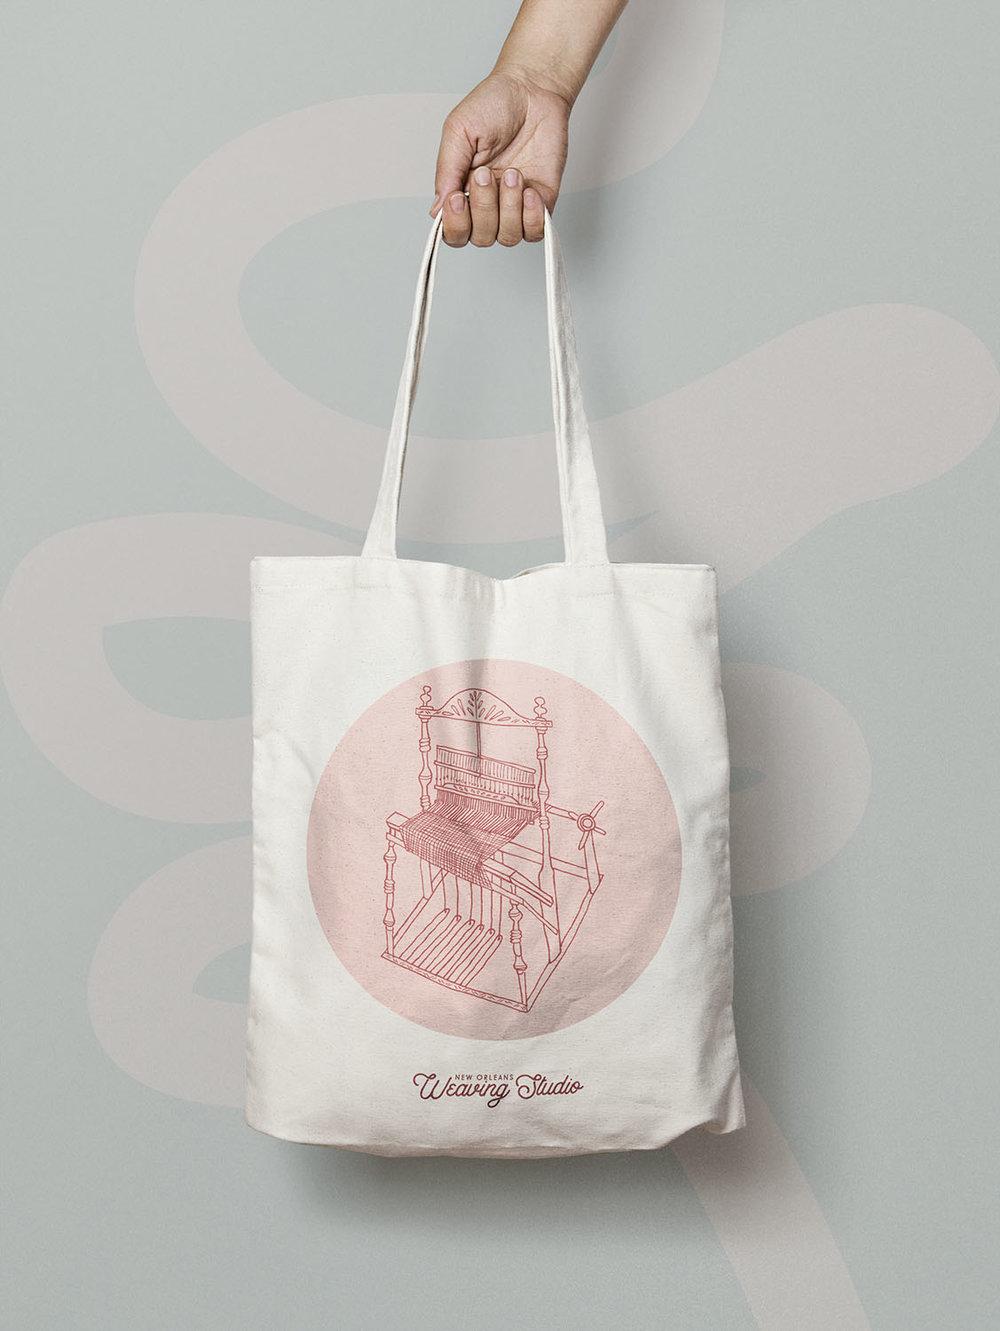 NOWS_Canvas Tote Bag MockUp.jpg